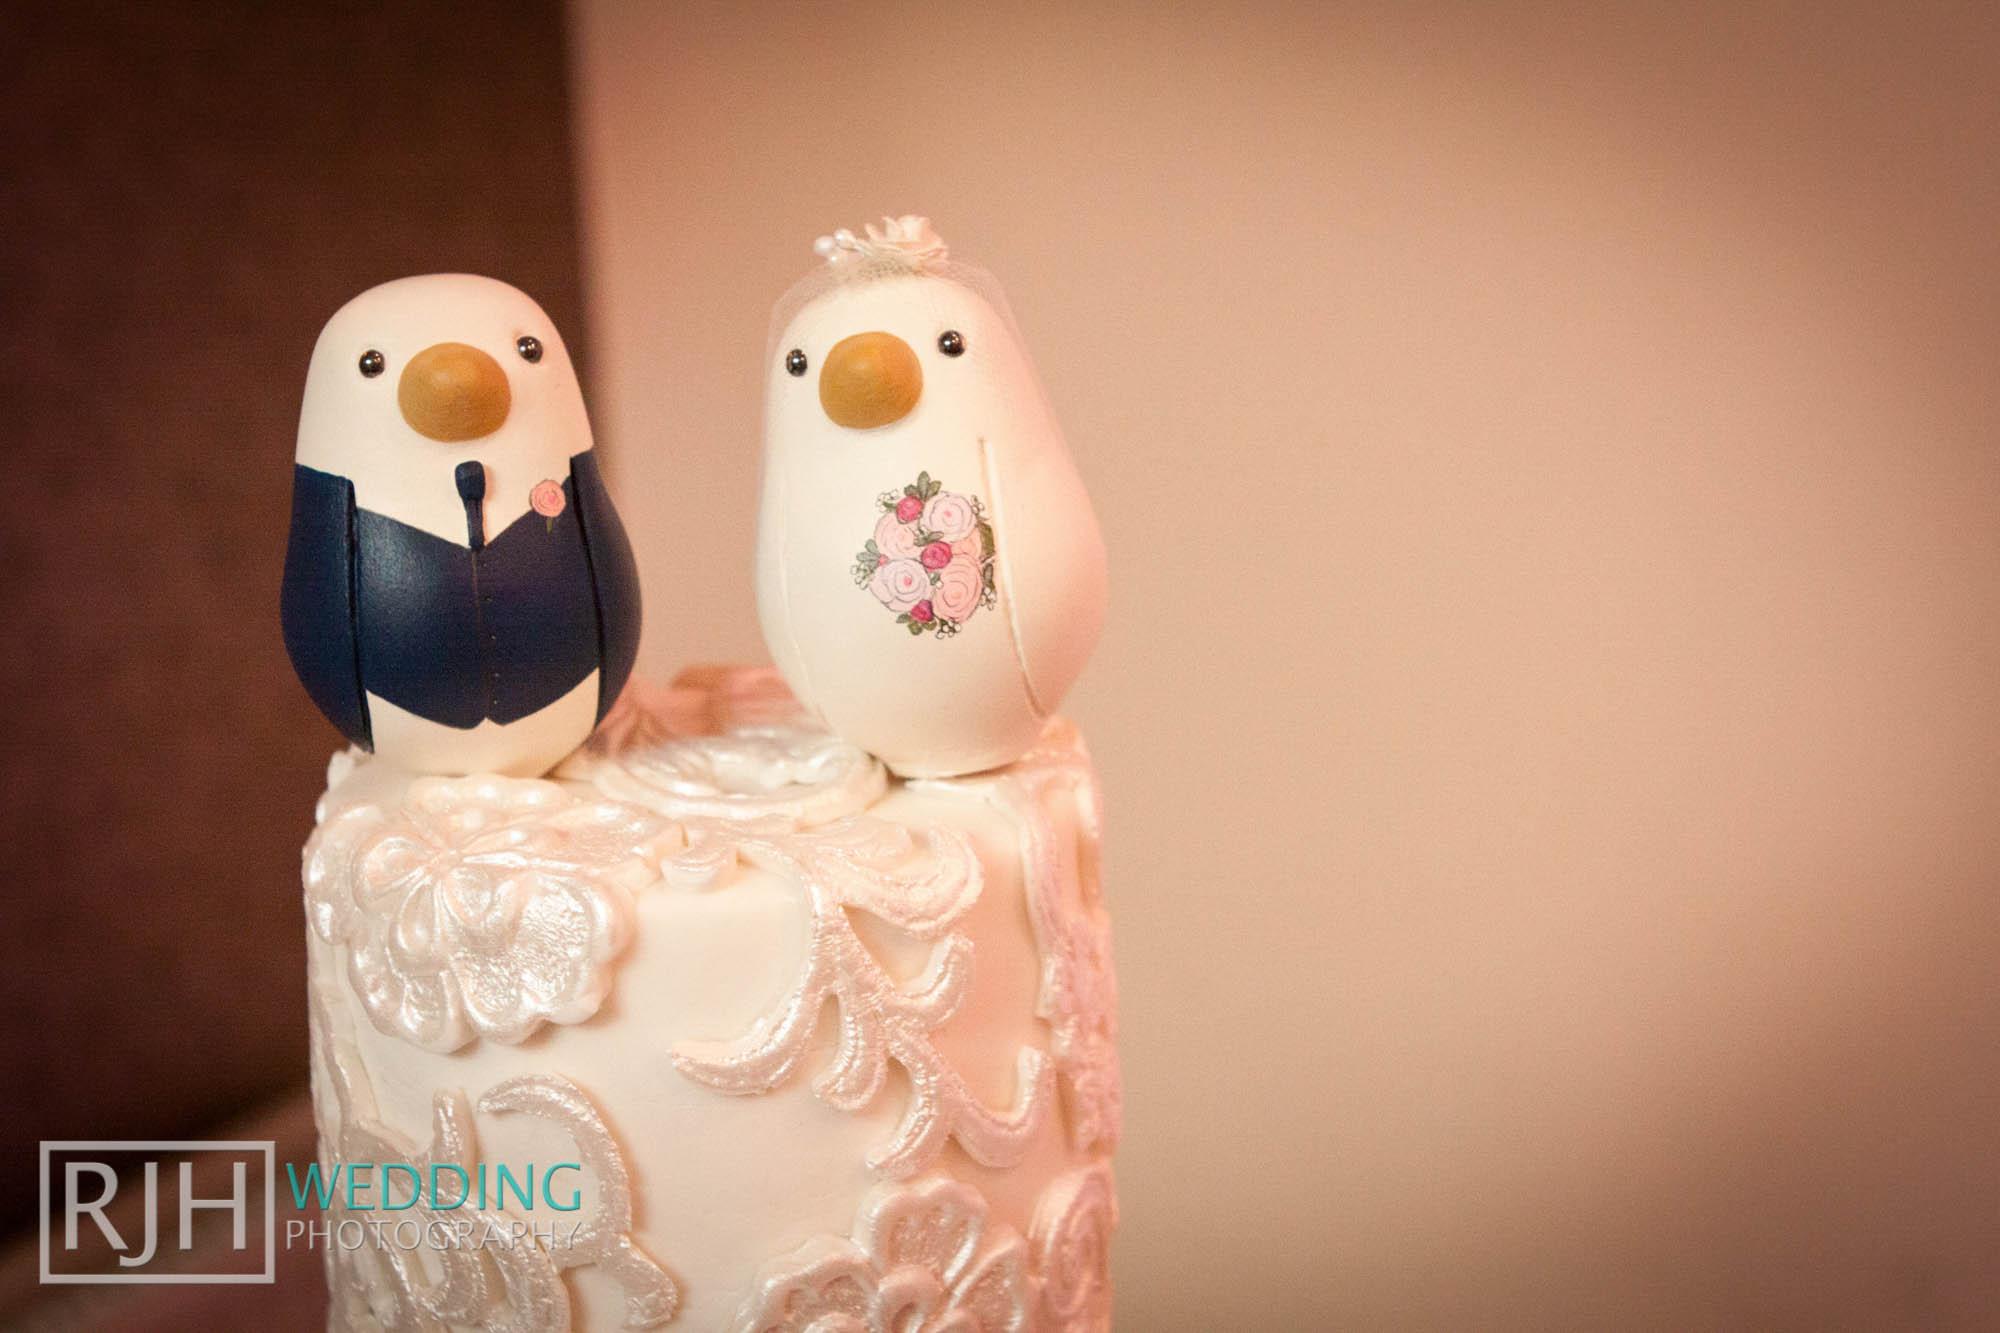 RJH Wedding Photography_Tankersley Manor Wedding_55.jpg